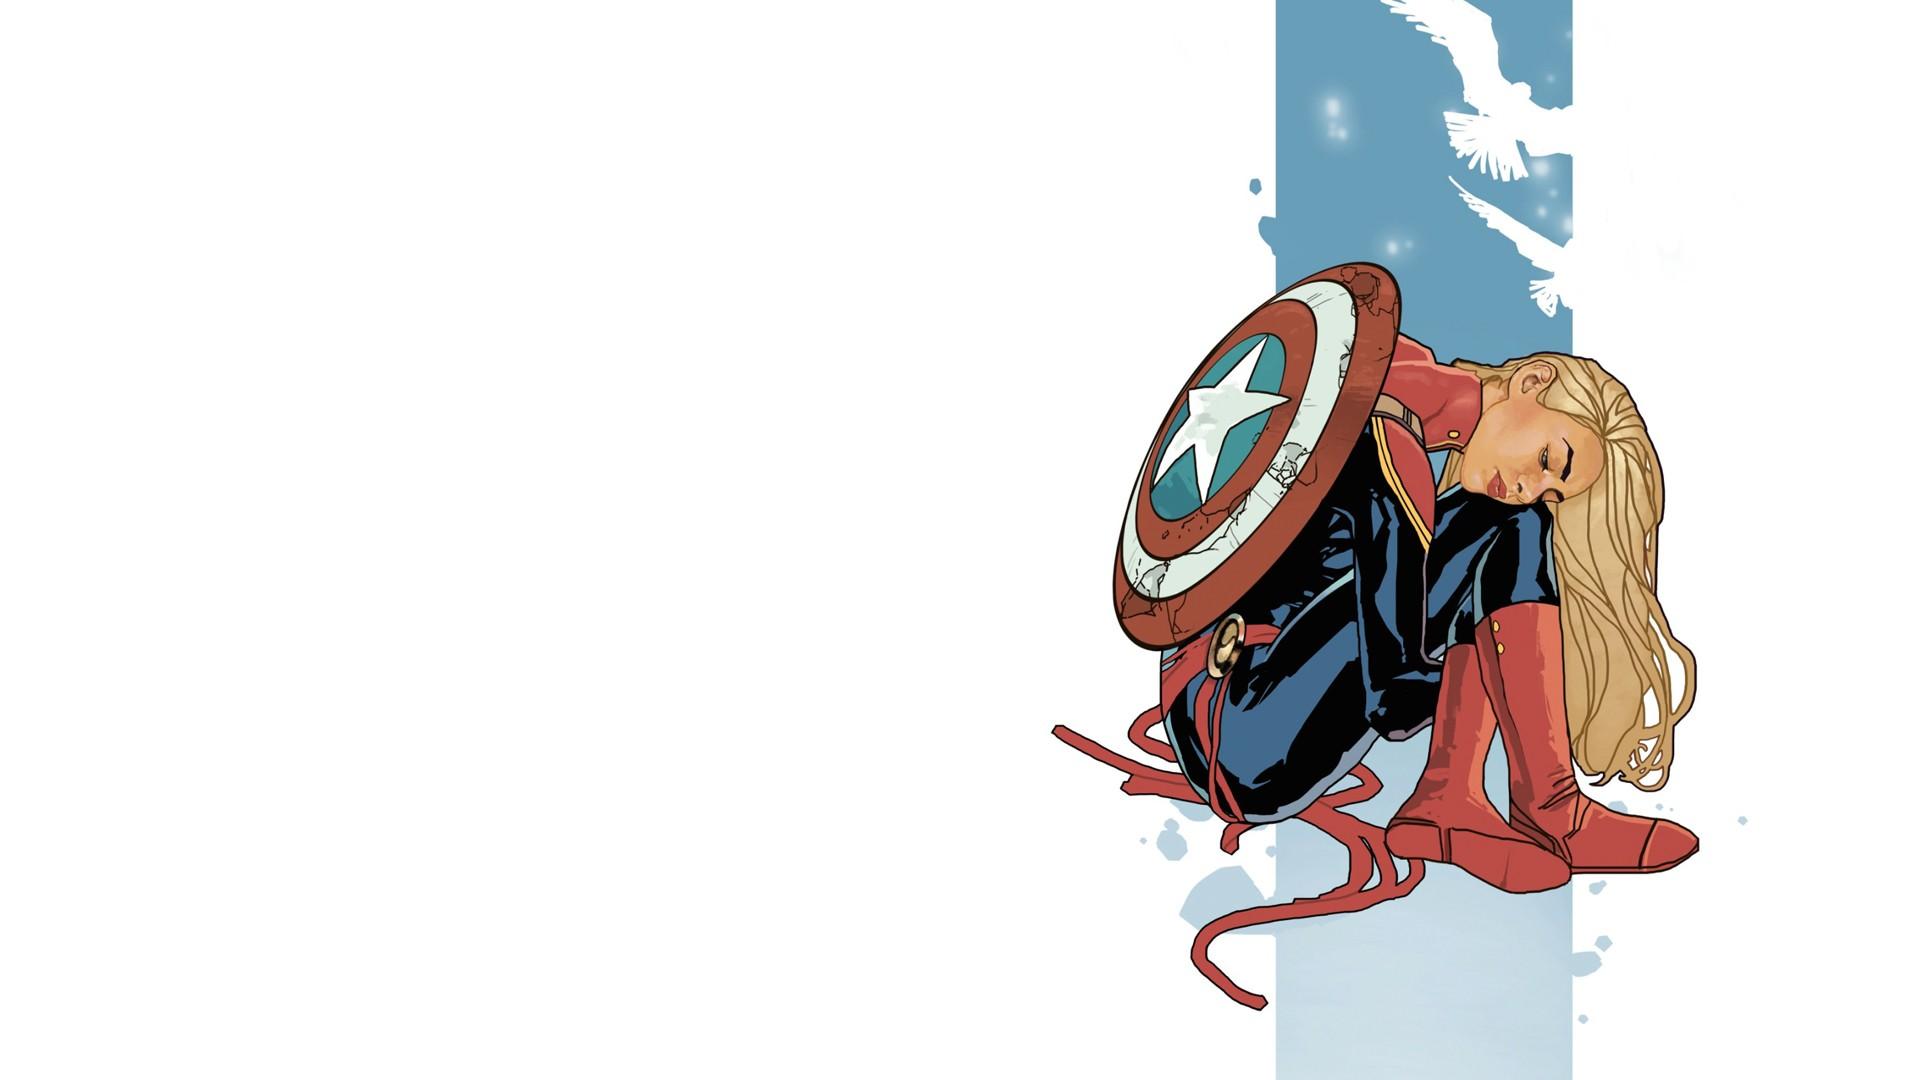 Marvel sesso cartone animato